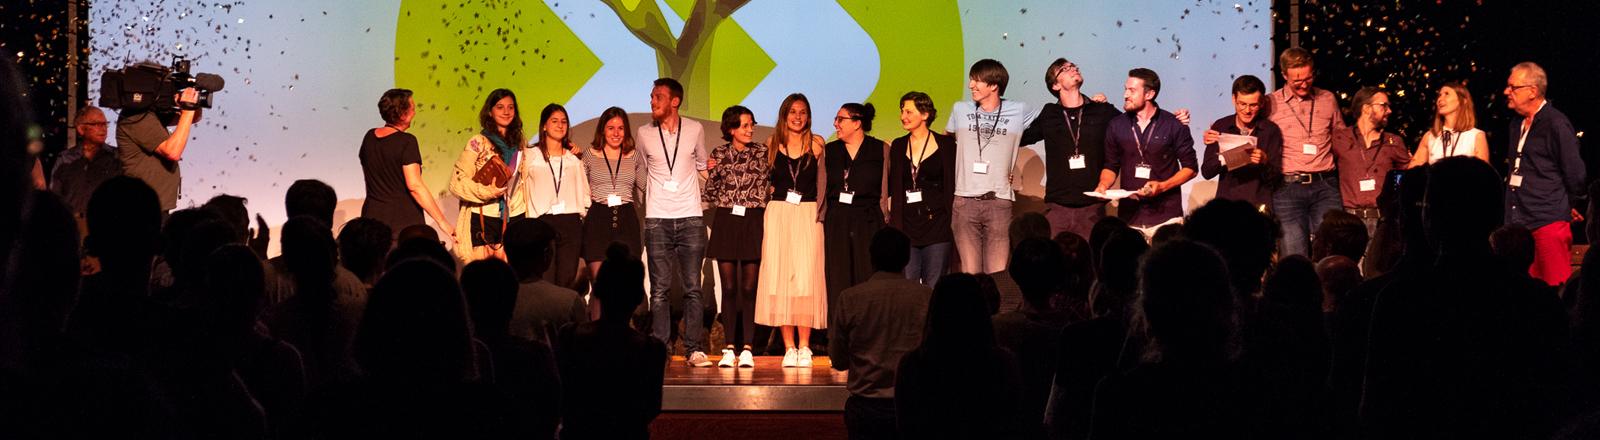 Festivalteam beim Bundesfestival Junger Film